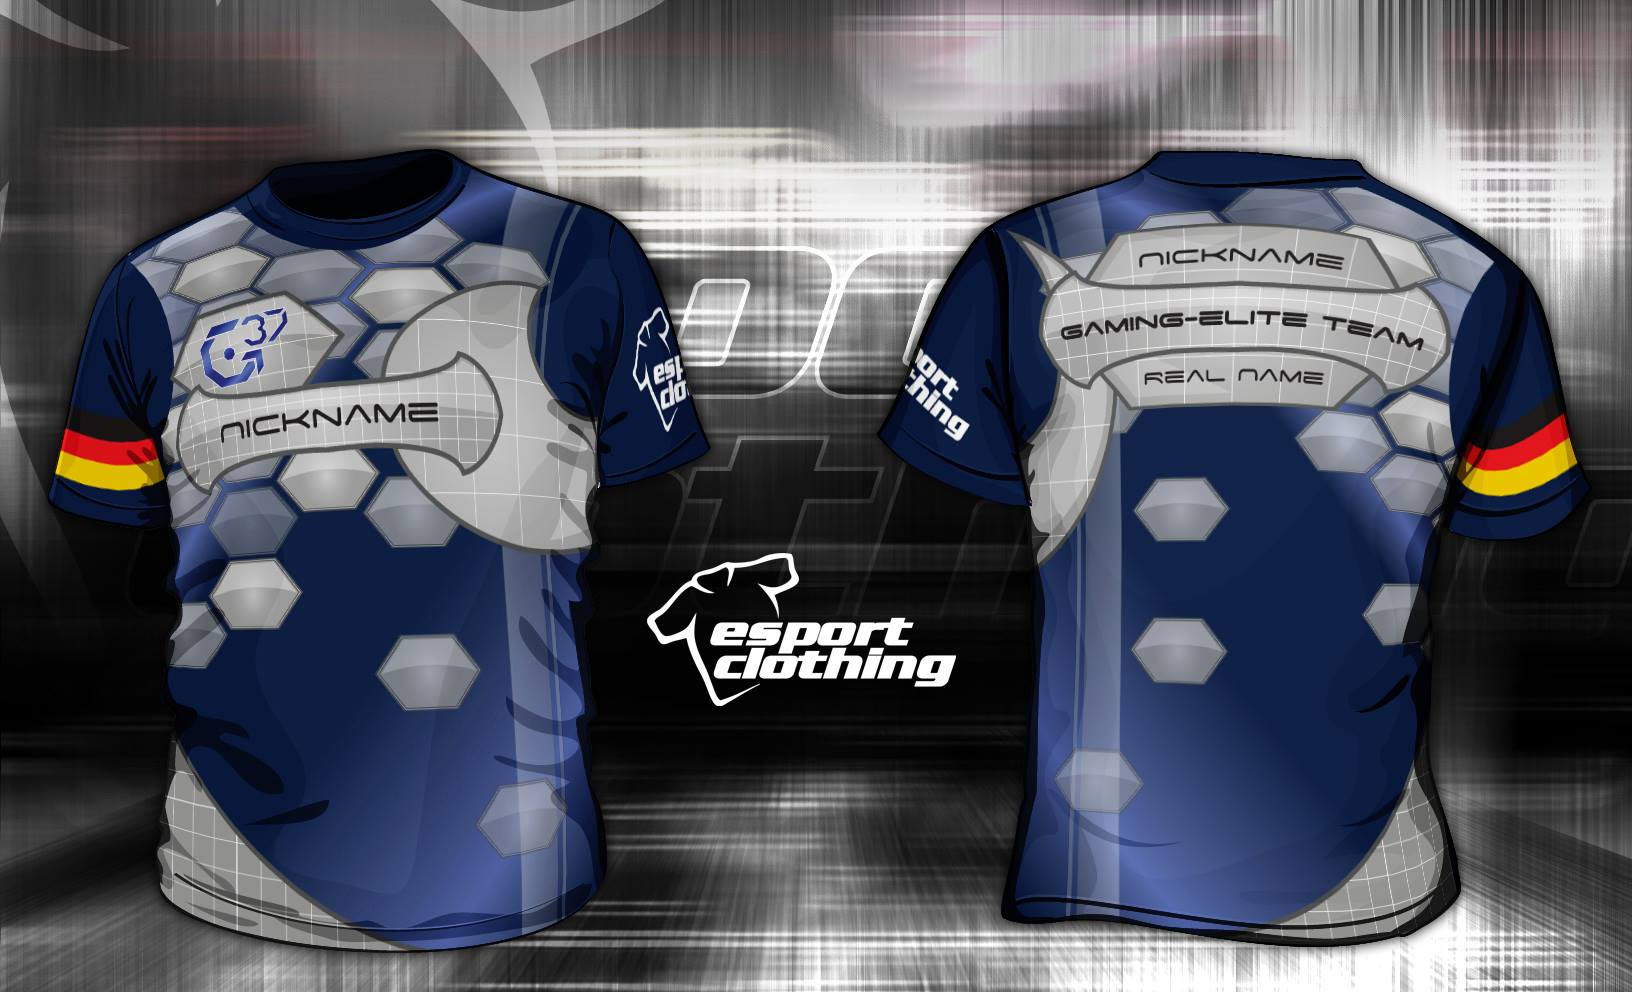 Gaming Elite Team - Athlete Short Sleeve Jersey